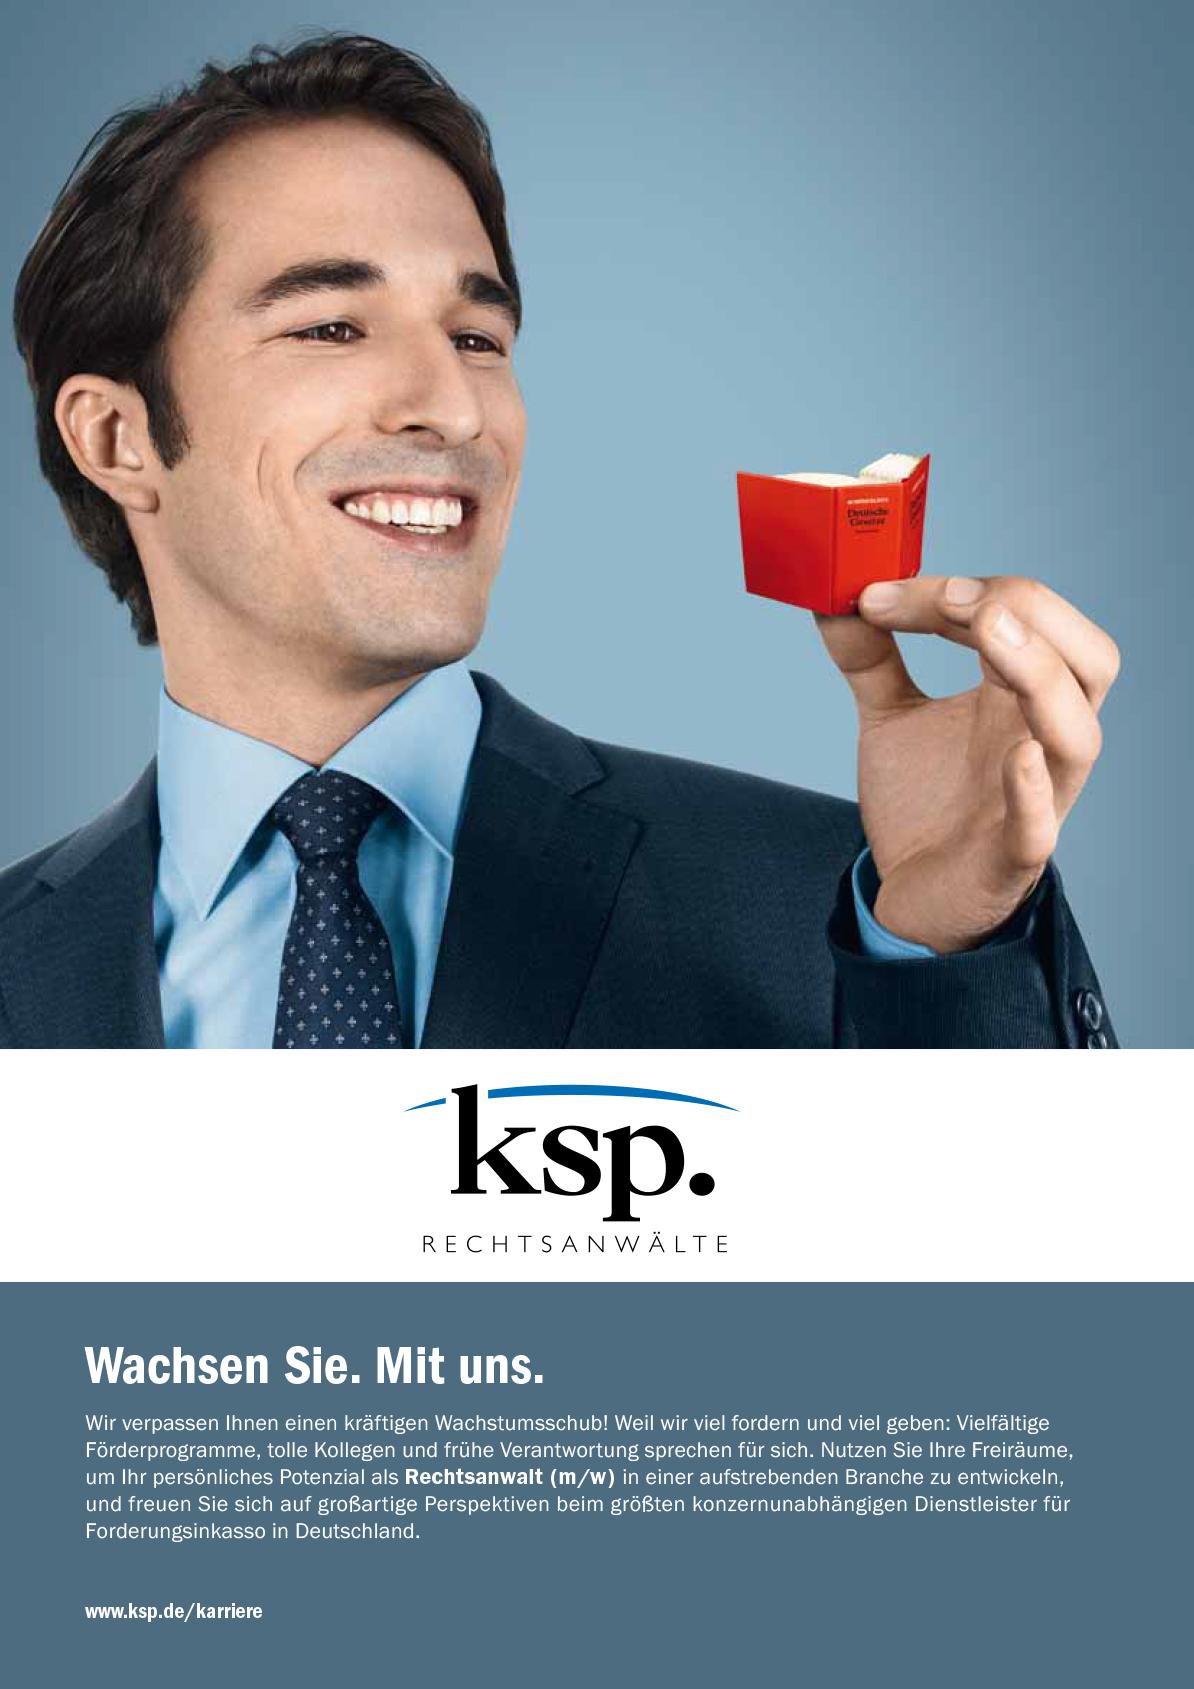 KSP_3